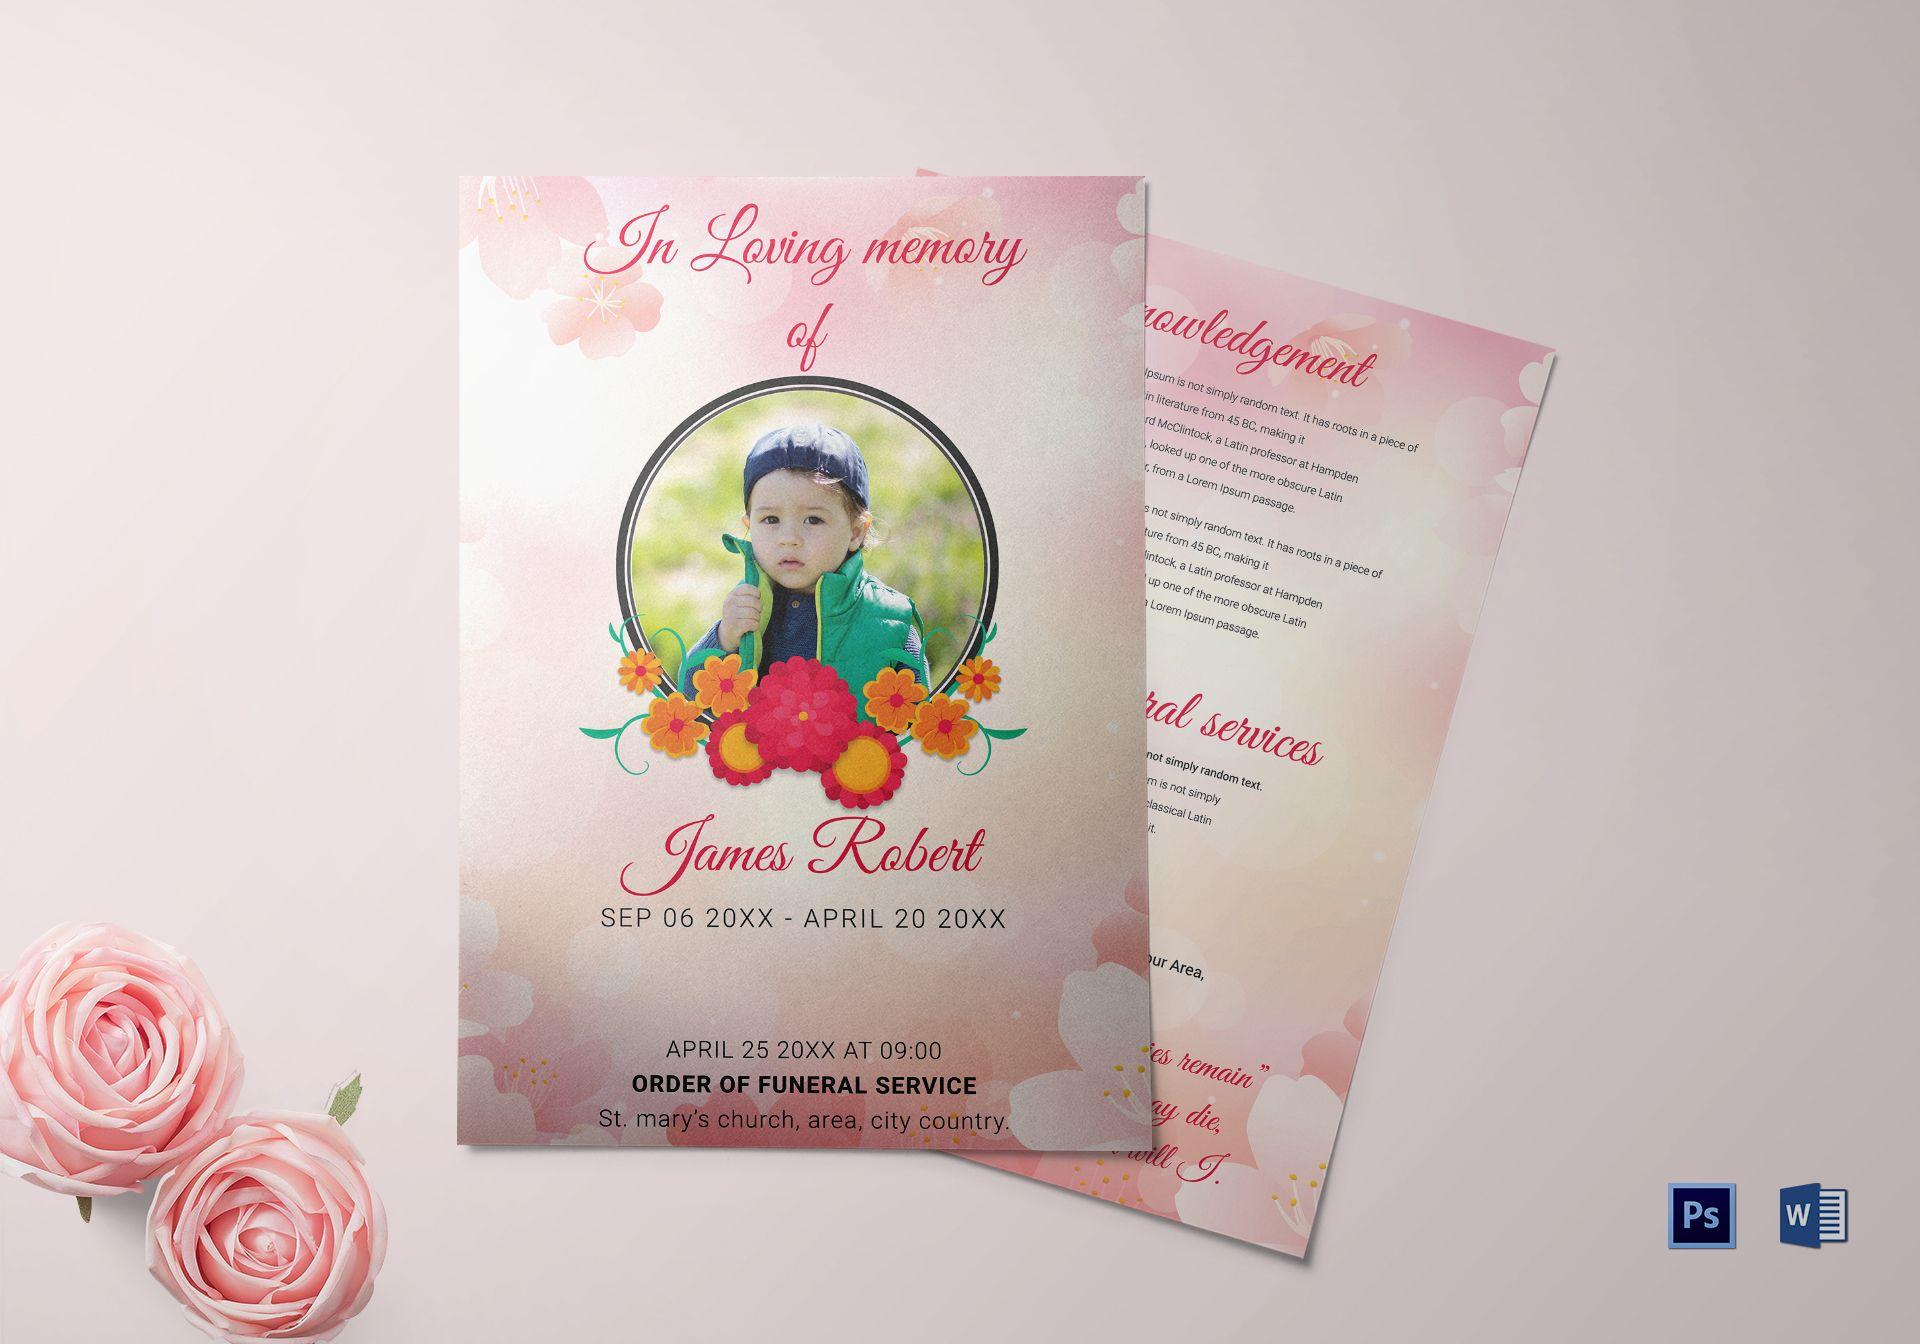 Elegant Funeral Template for Kids